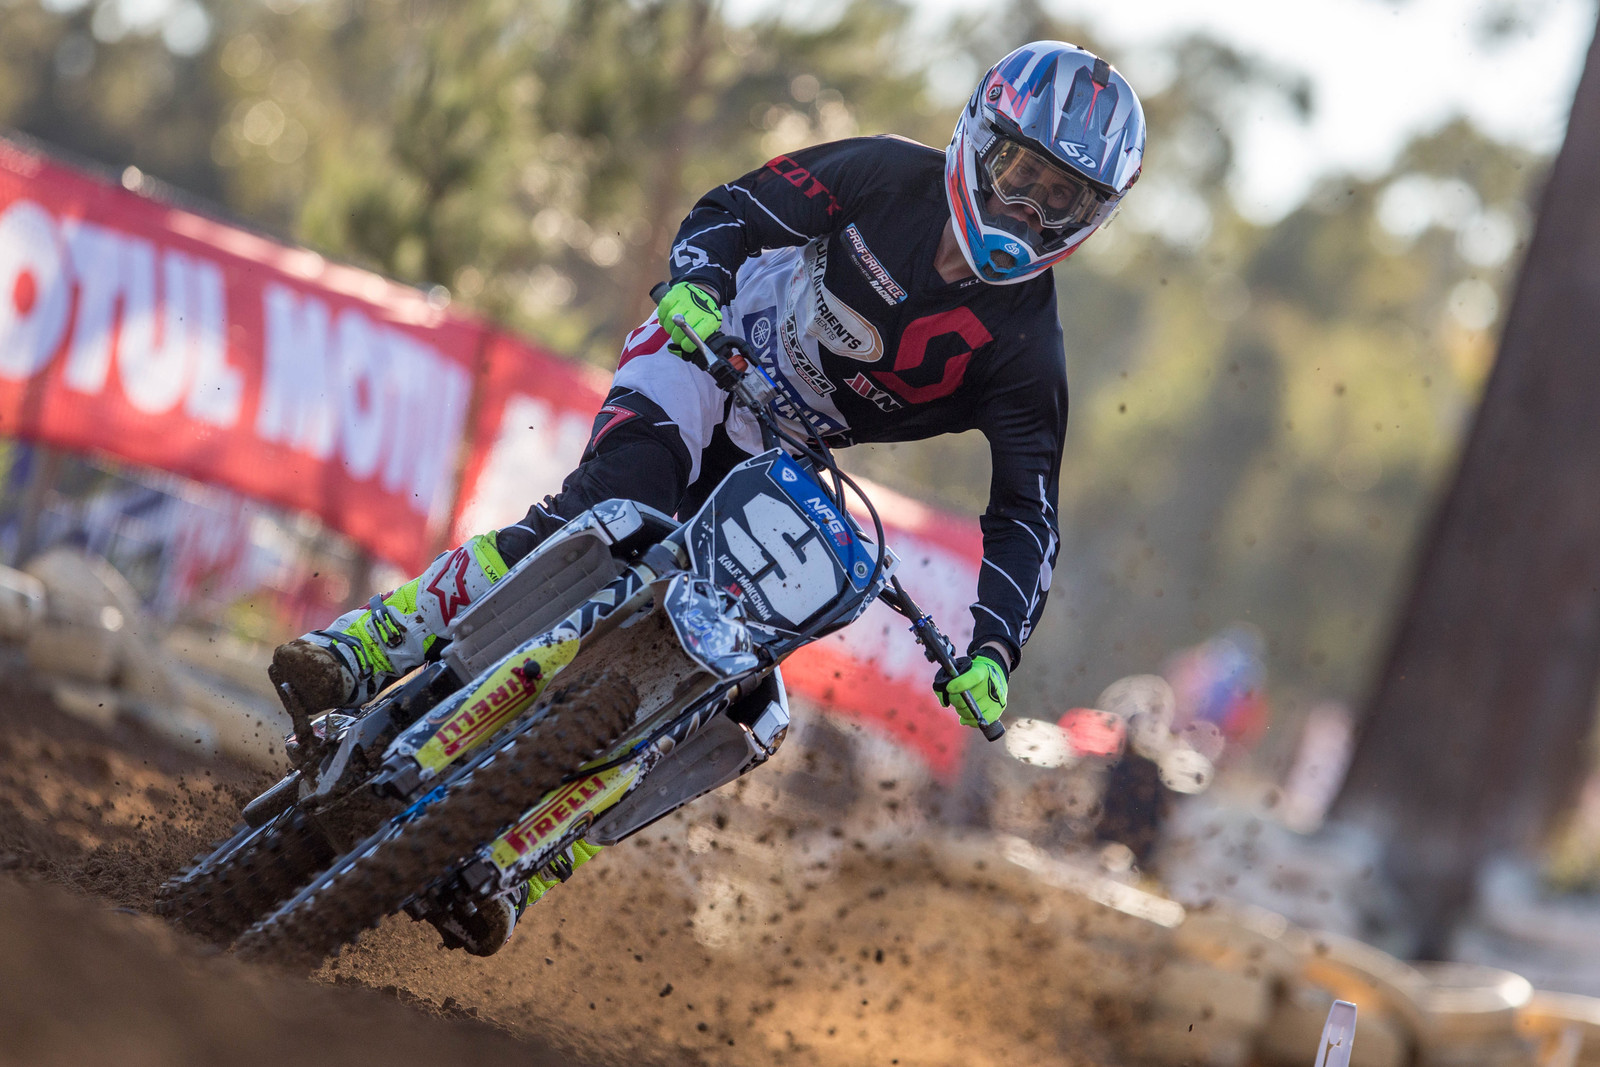 Kale Makeham - Australian Motul MX Championships: Round 6, Nowra - Motocross Pictures - Vital MX